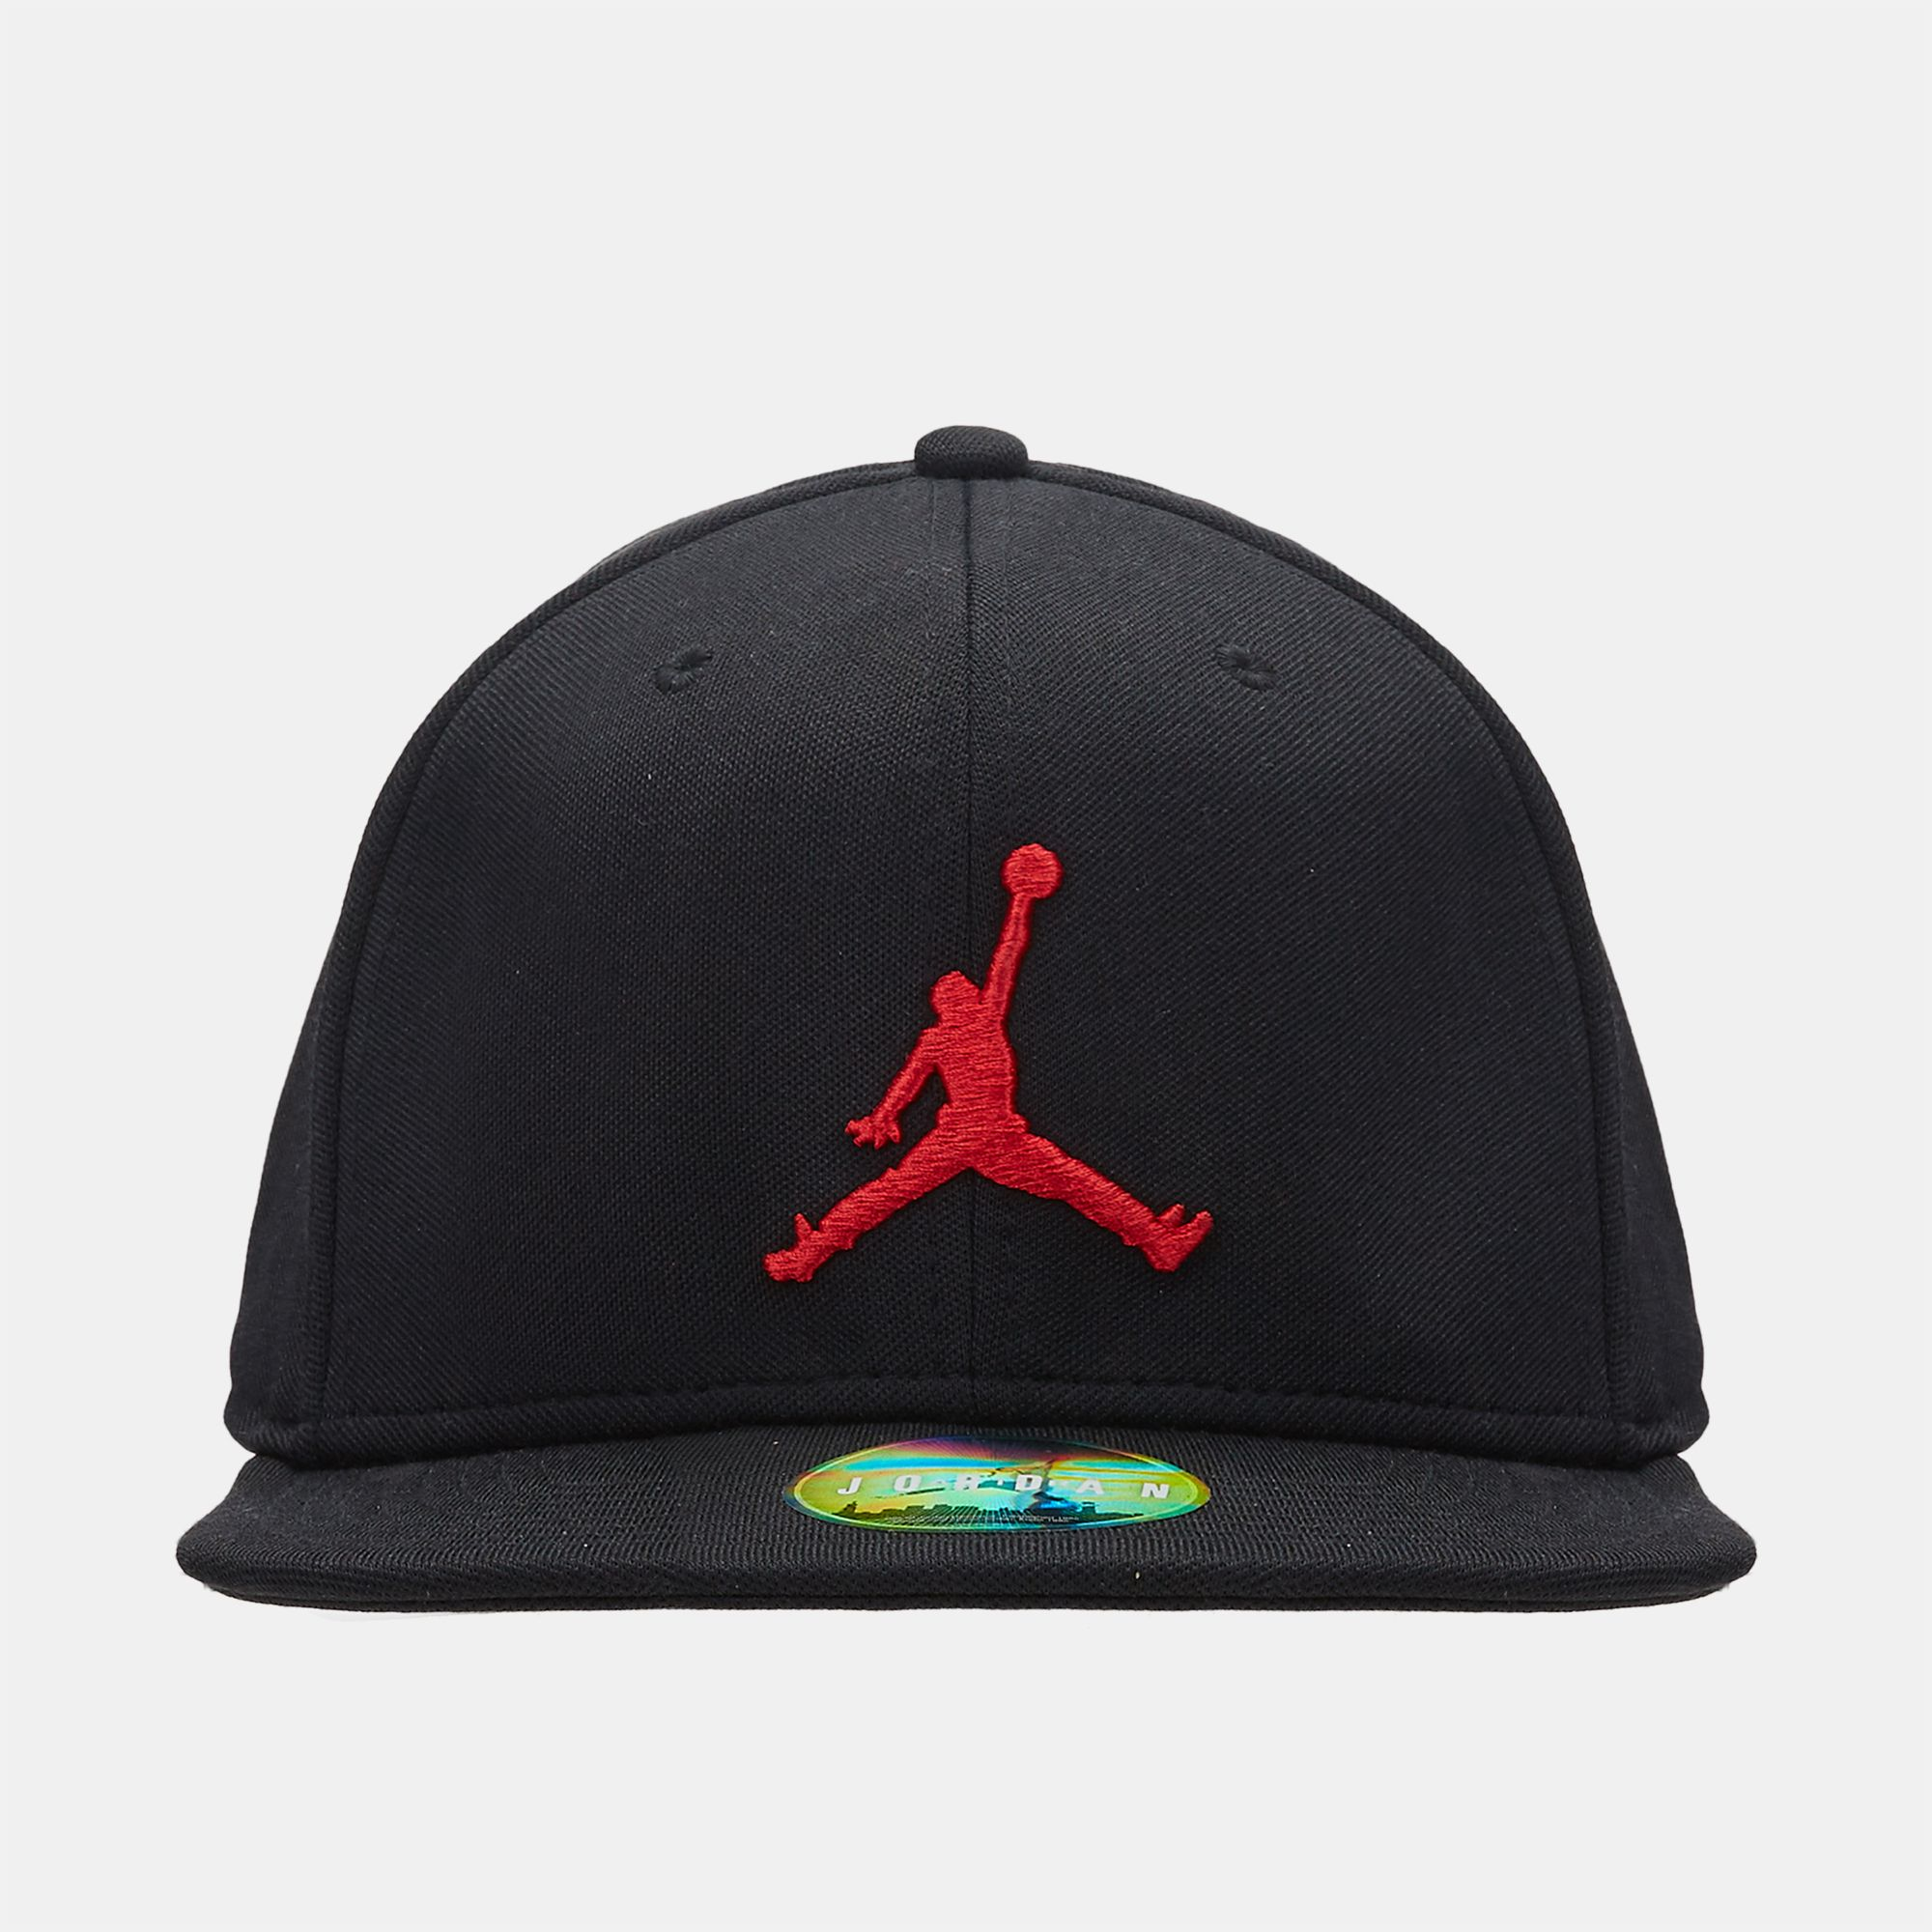 Shop Black Jordan Jumpman Snapback for Unisex by Jordan  aa2c930560a